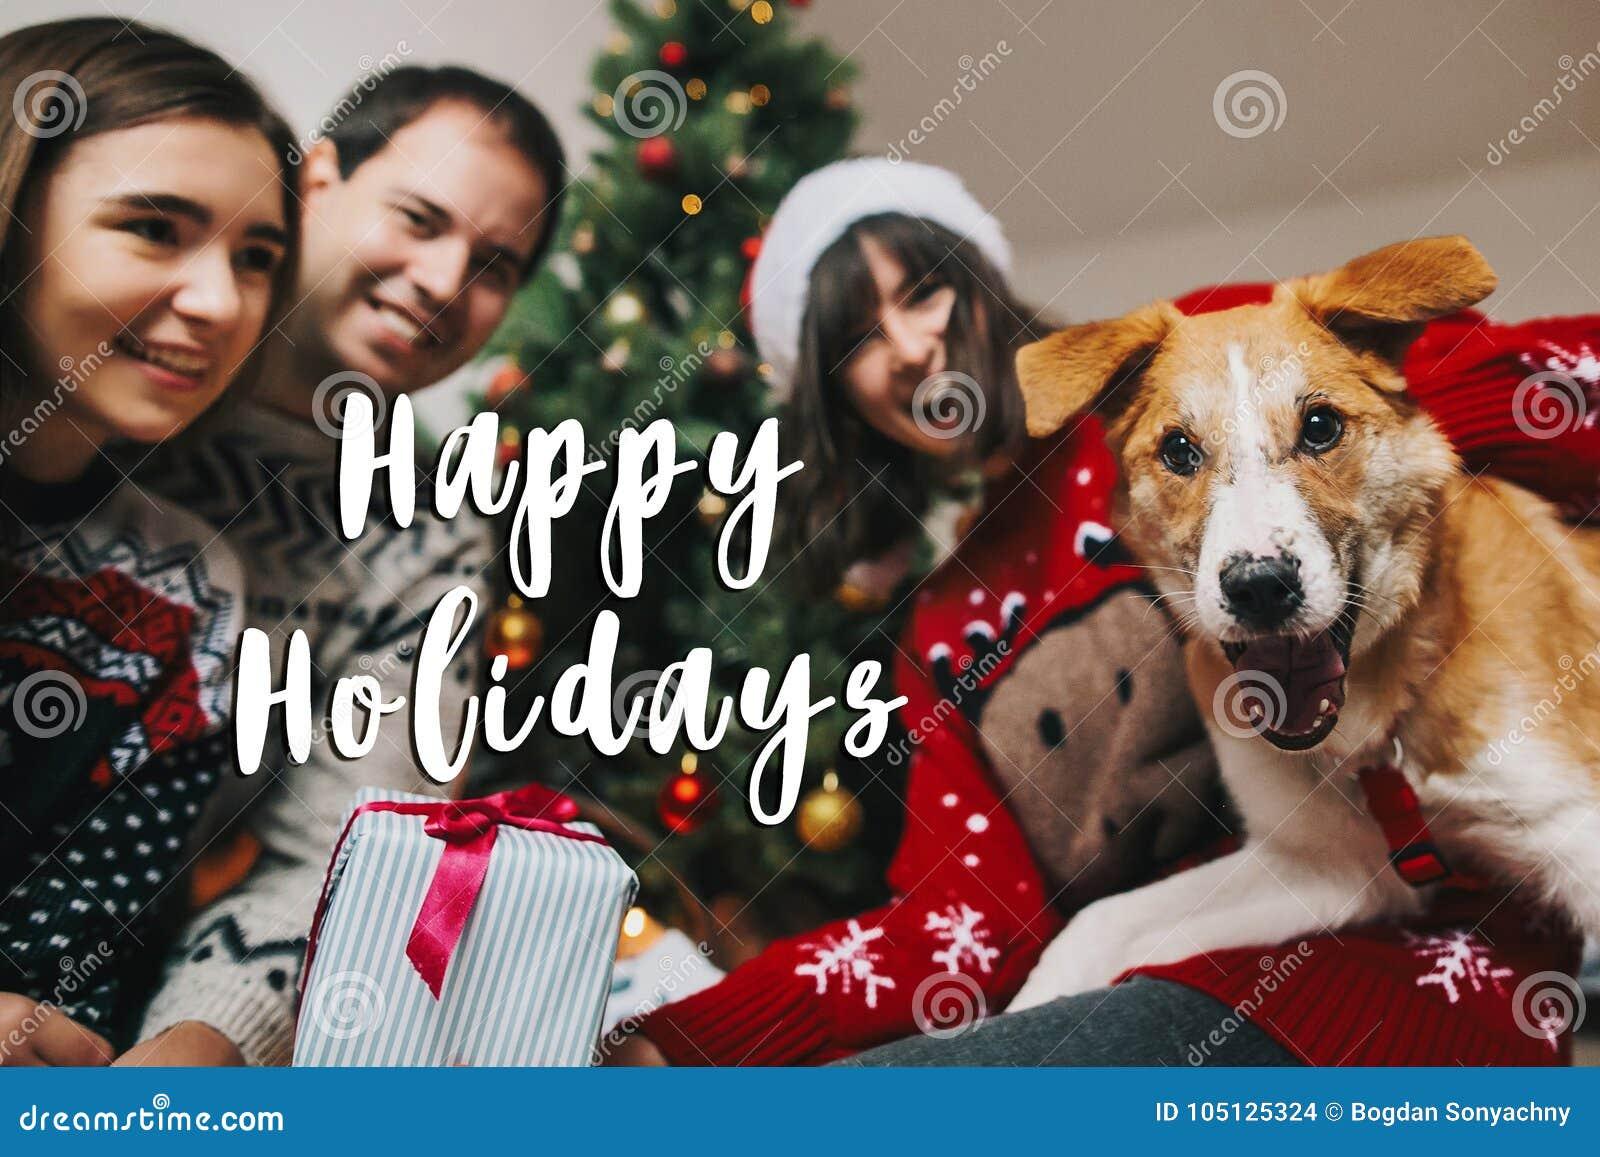 Happy holidays text sign, greeting card. happy family having fun